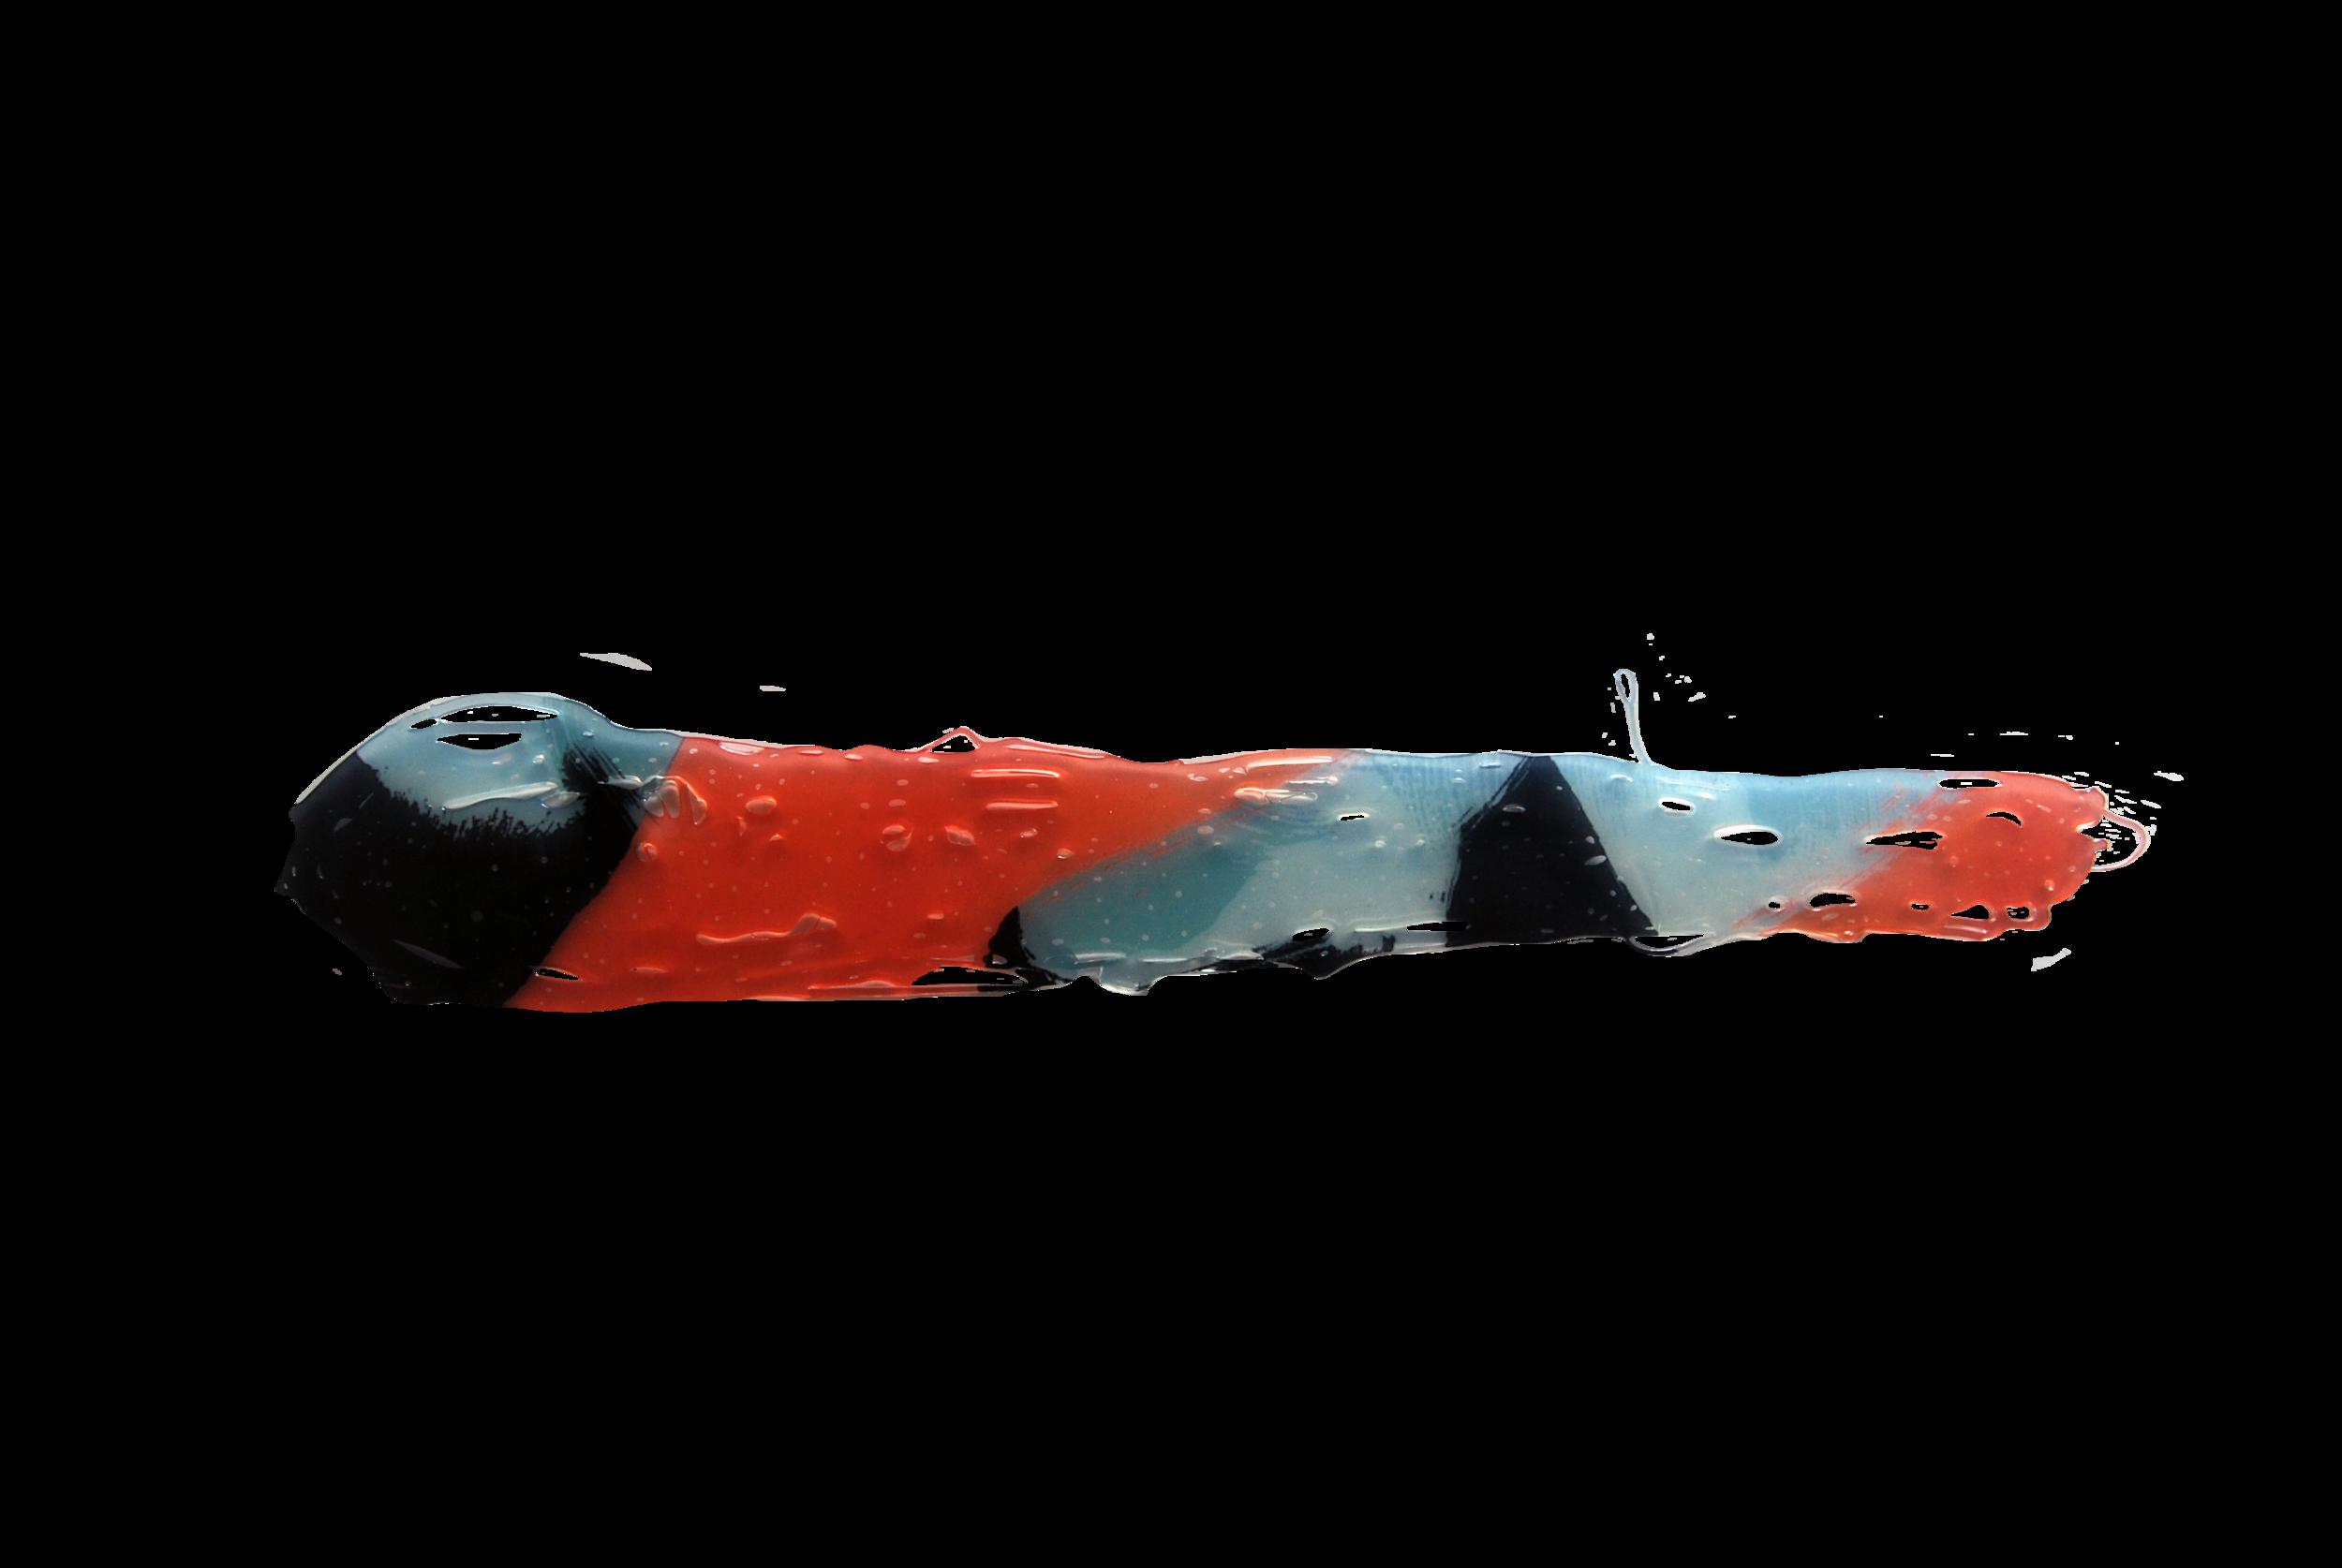 TRANSFER nº3, 2015, Transferencia Digital sobre cola termofusible. 5,5 x 38 cm